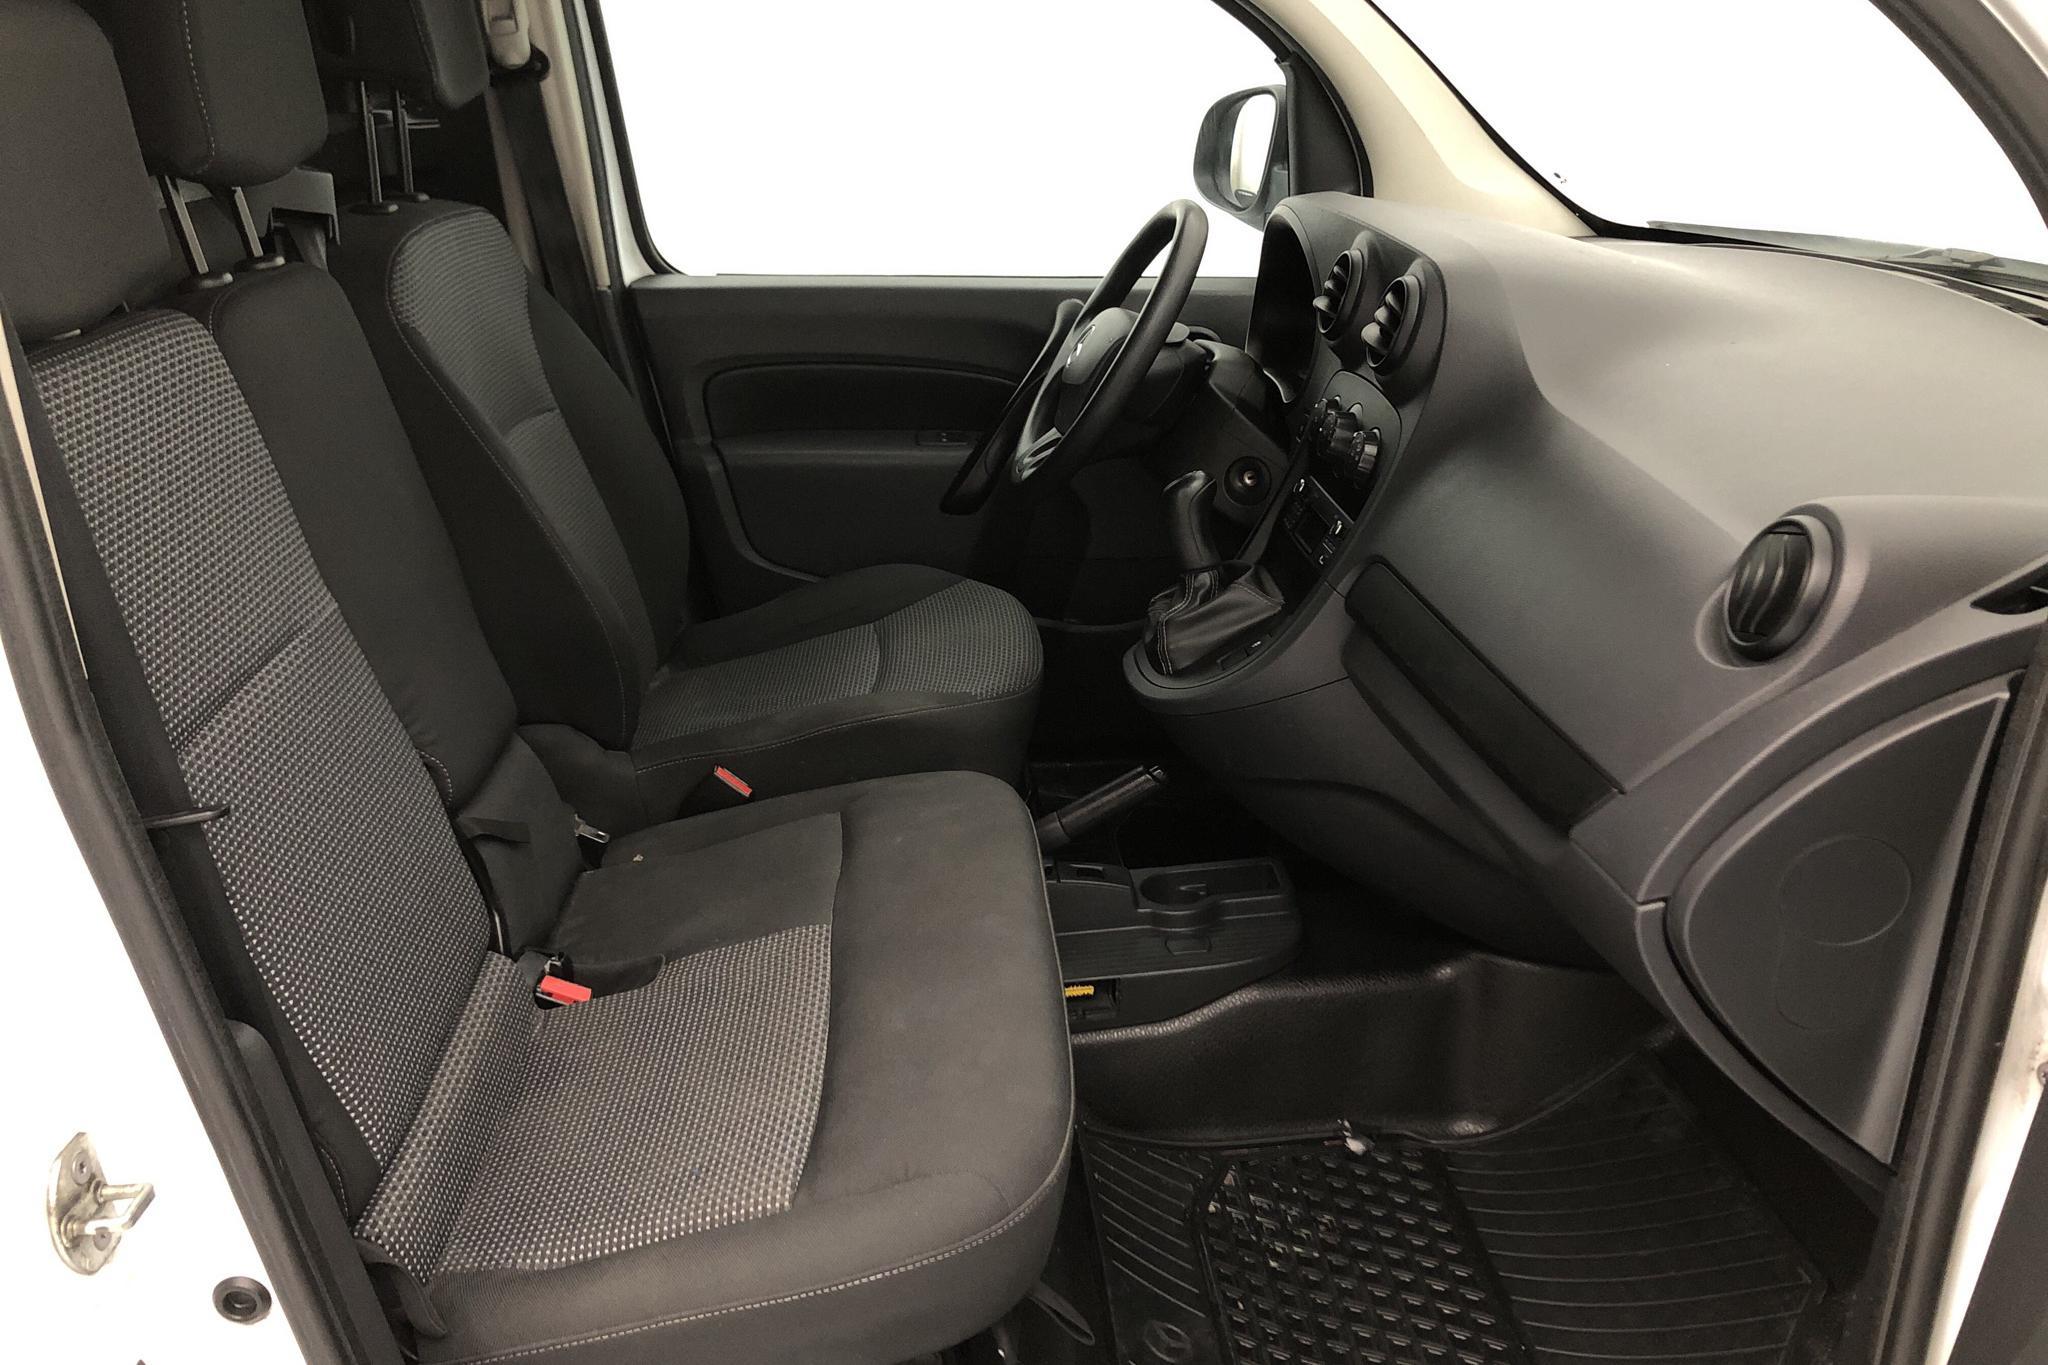 Mercedes Citan 109 1.5 CDI (90hk) - 14 887 mil - Manuell - vit - 2017